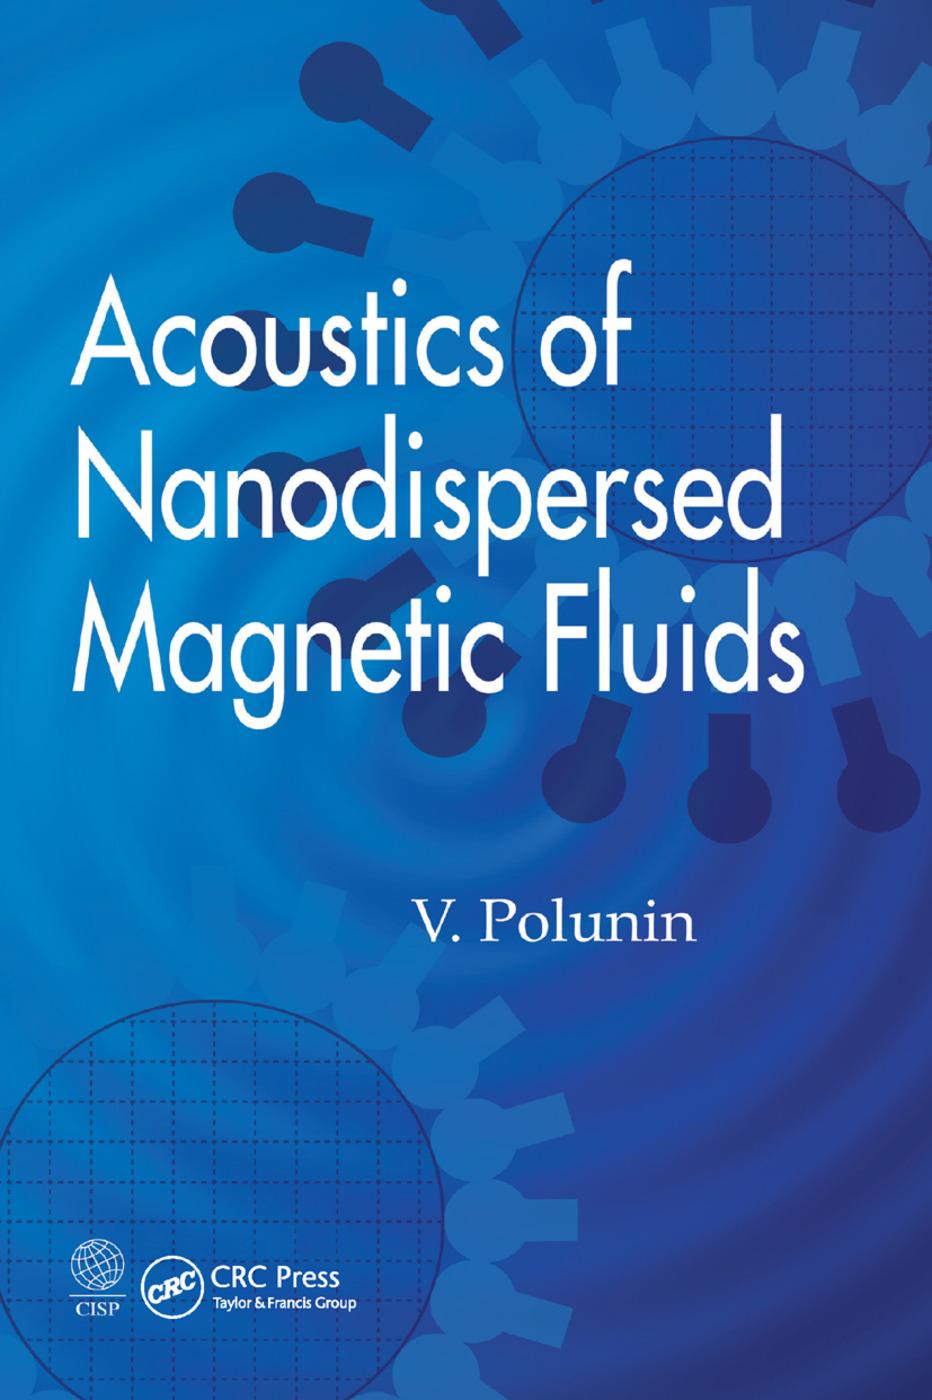 Acoustics of Nanodispersed Magnetic Fluids